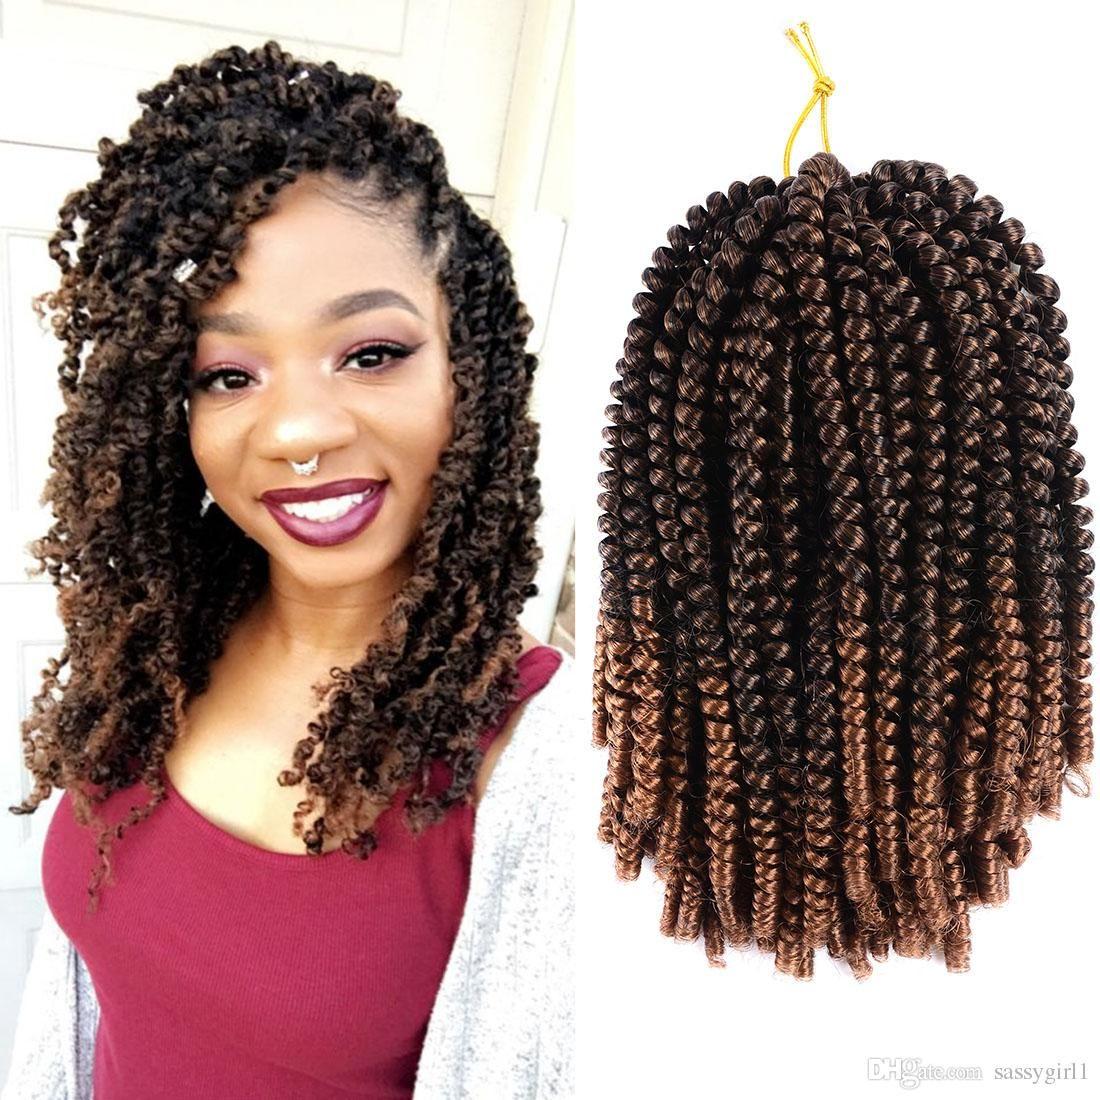 2019 Hot Senegal Twist Curly Goddess 12inch Spring